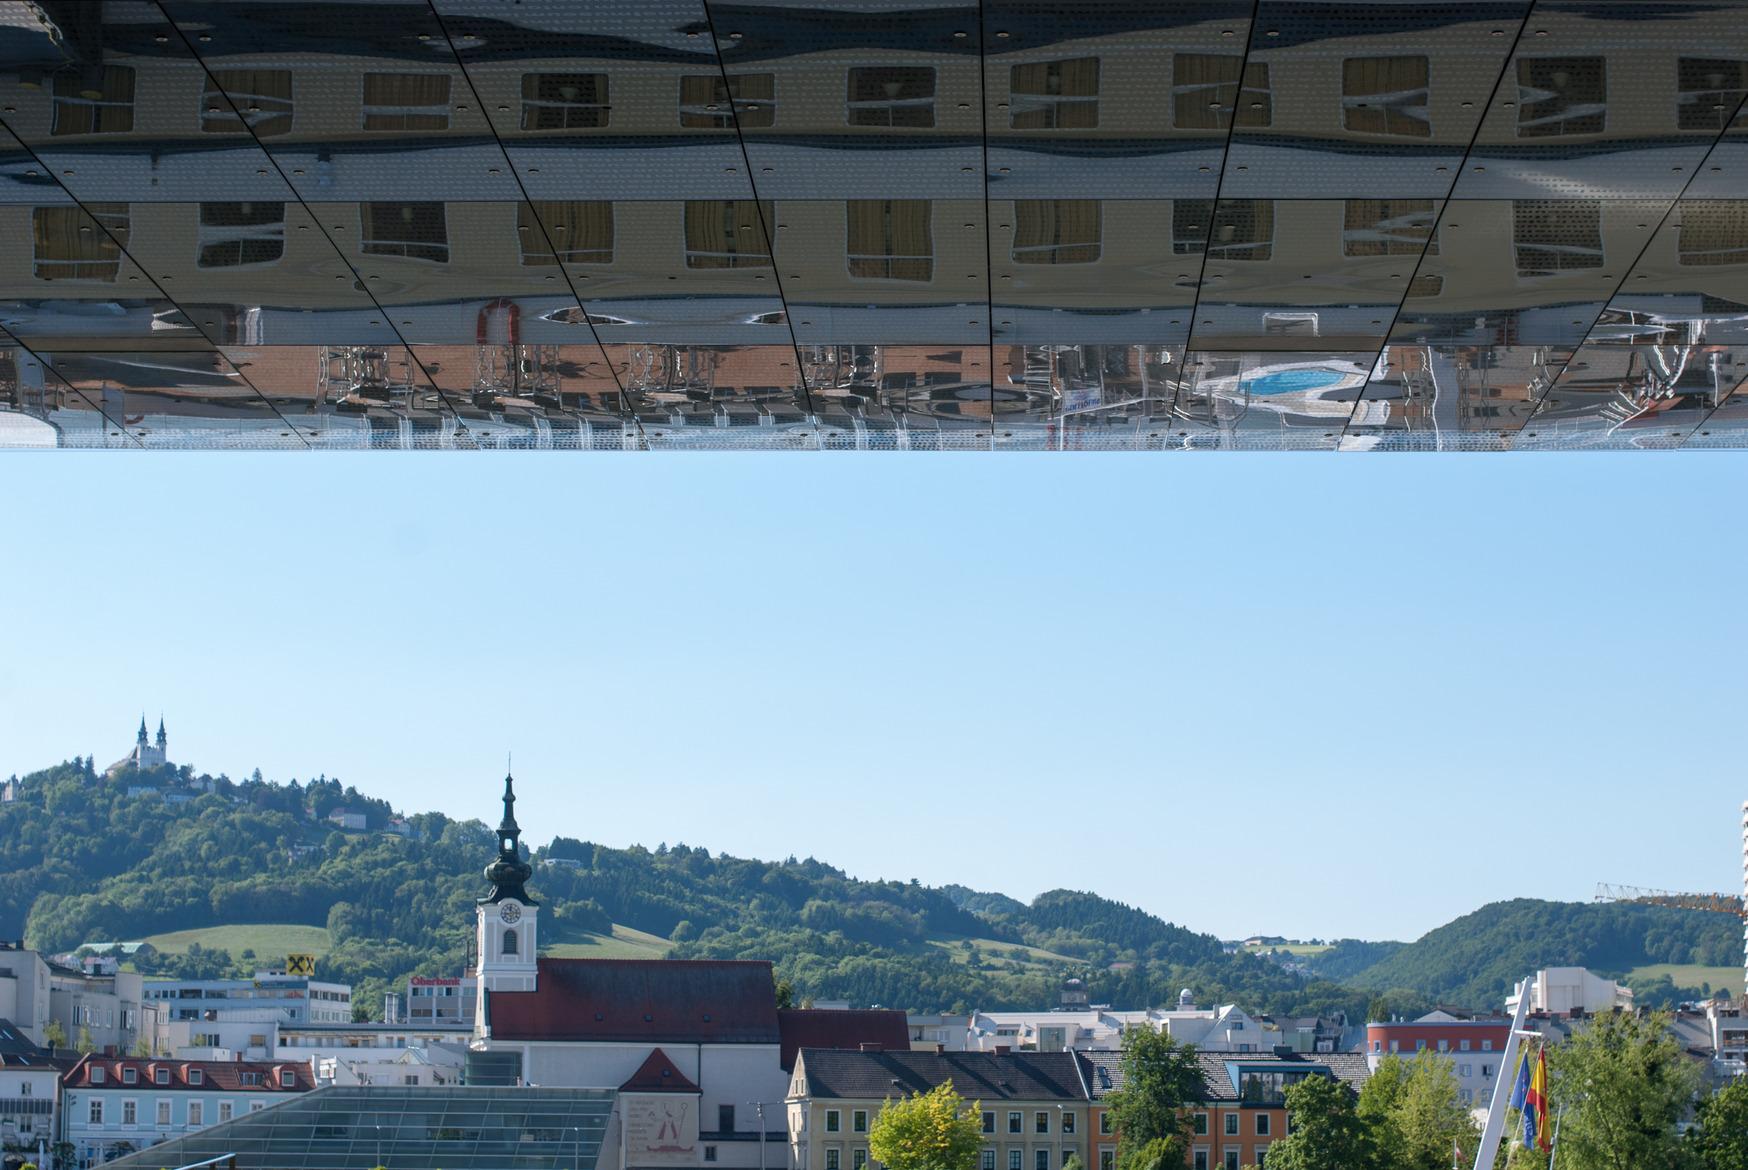 LentosPoestlingberg_Linz©linztourismus_